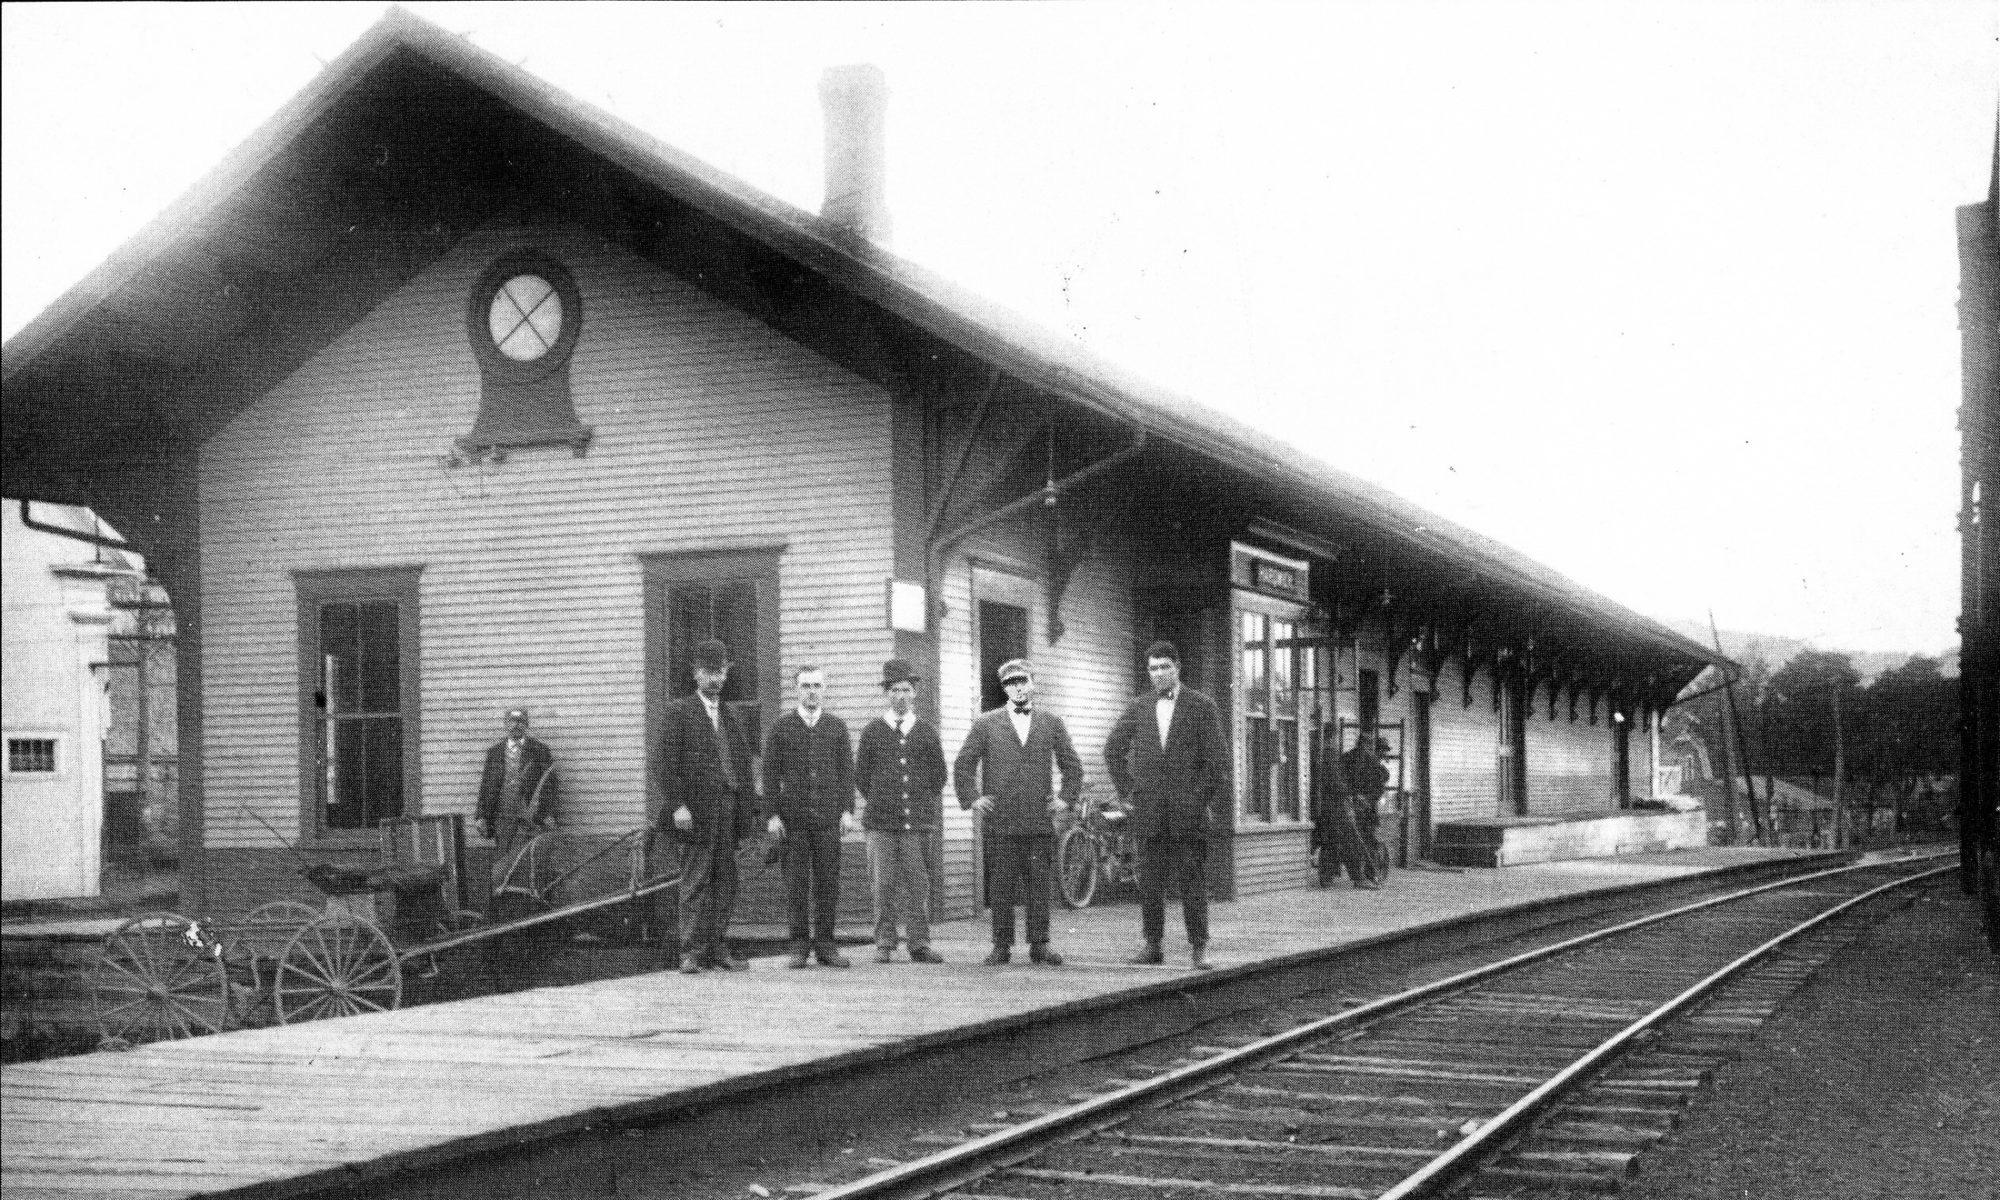 Hardwick, VT Historical Society